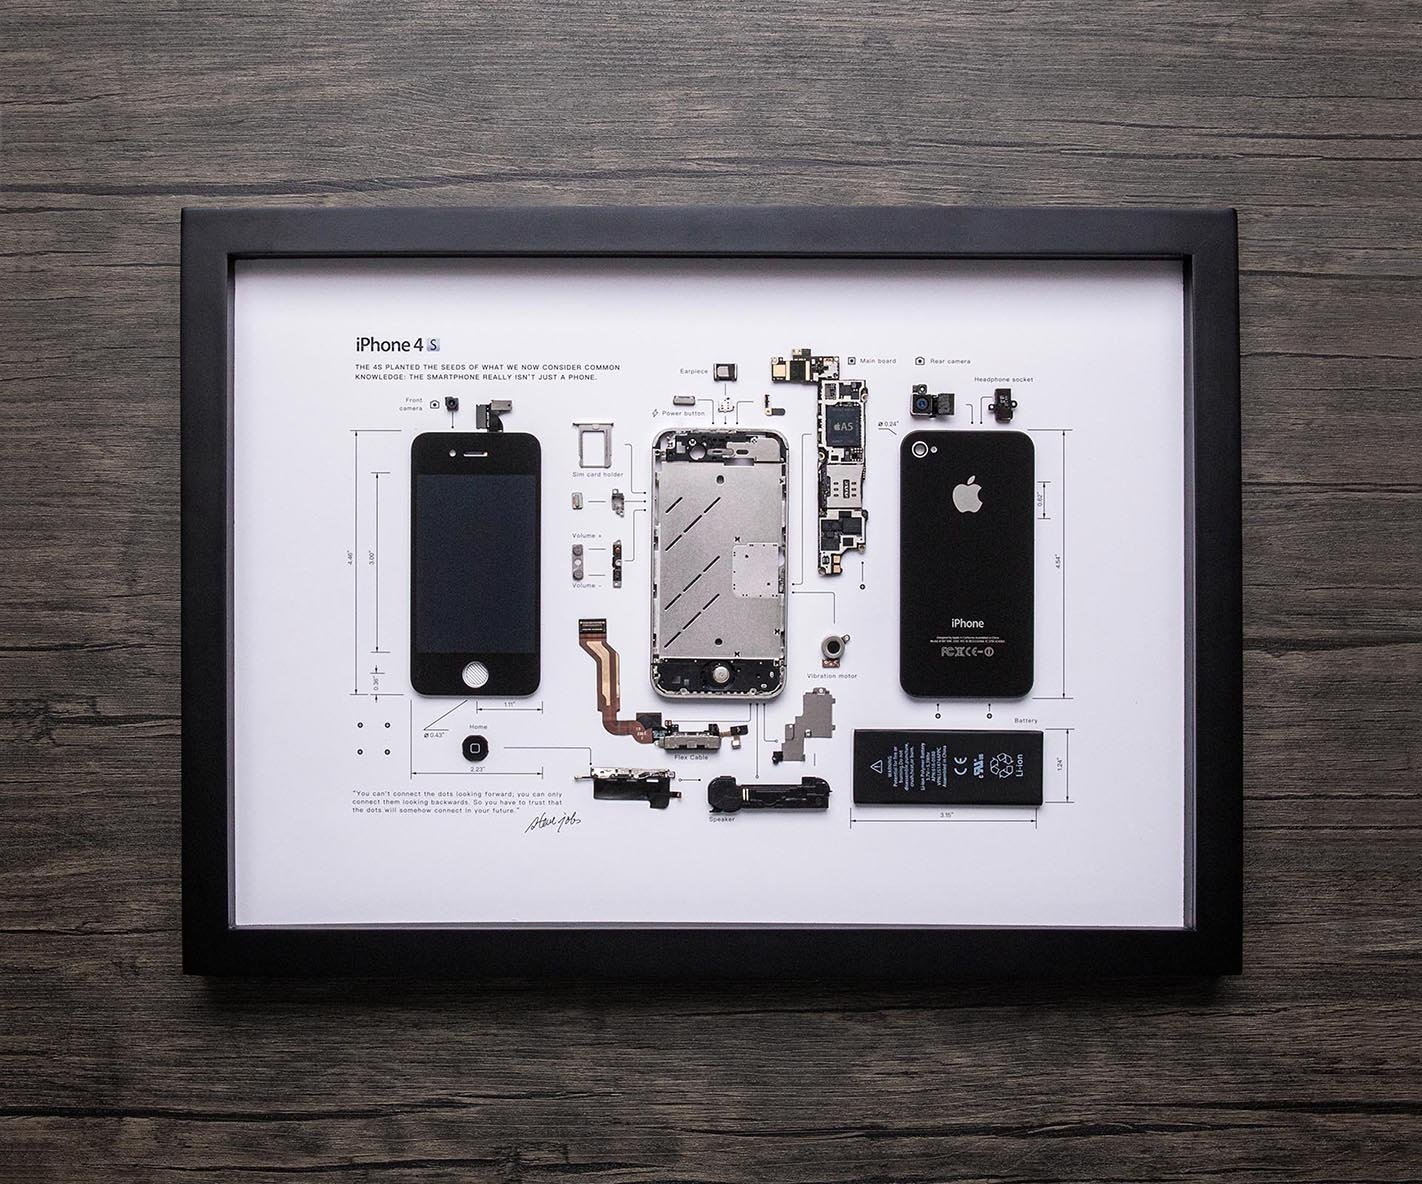 iPhone 4s emoldurado pelo estúdio Grid